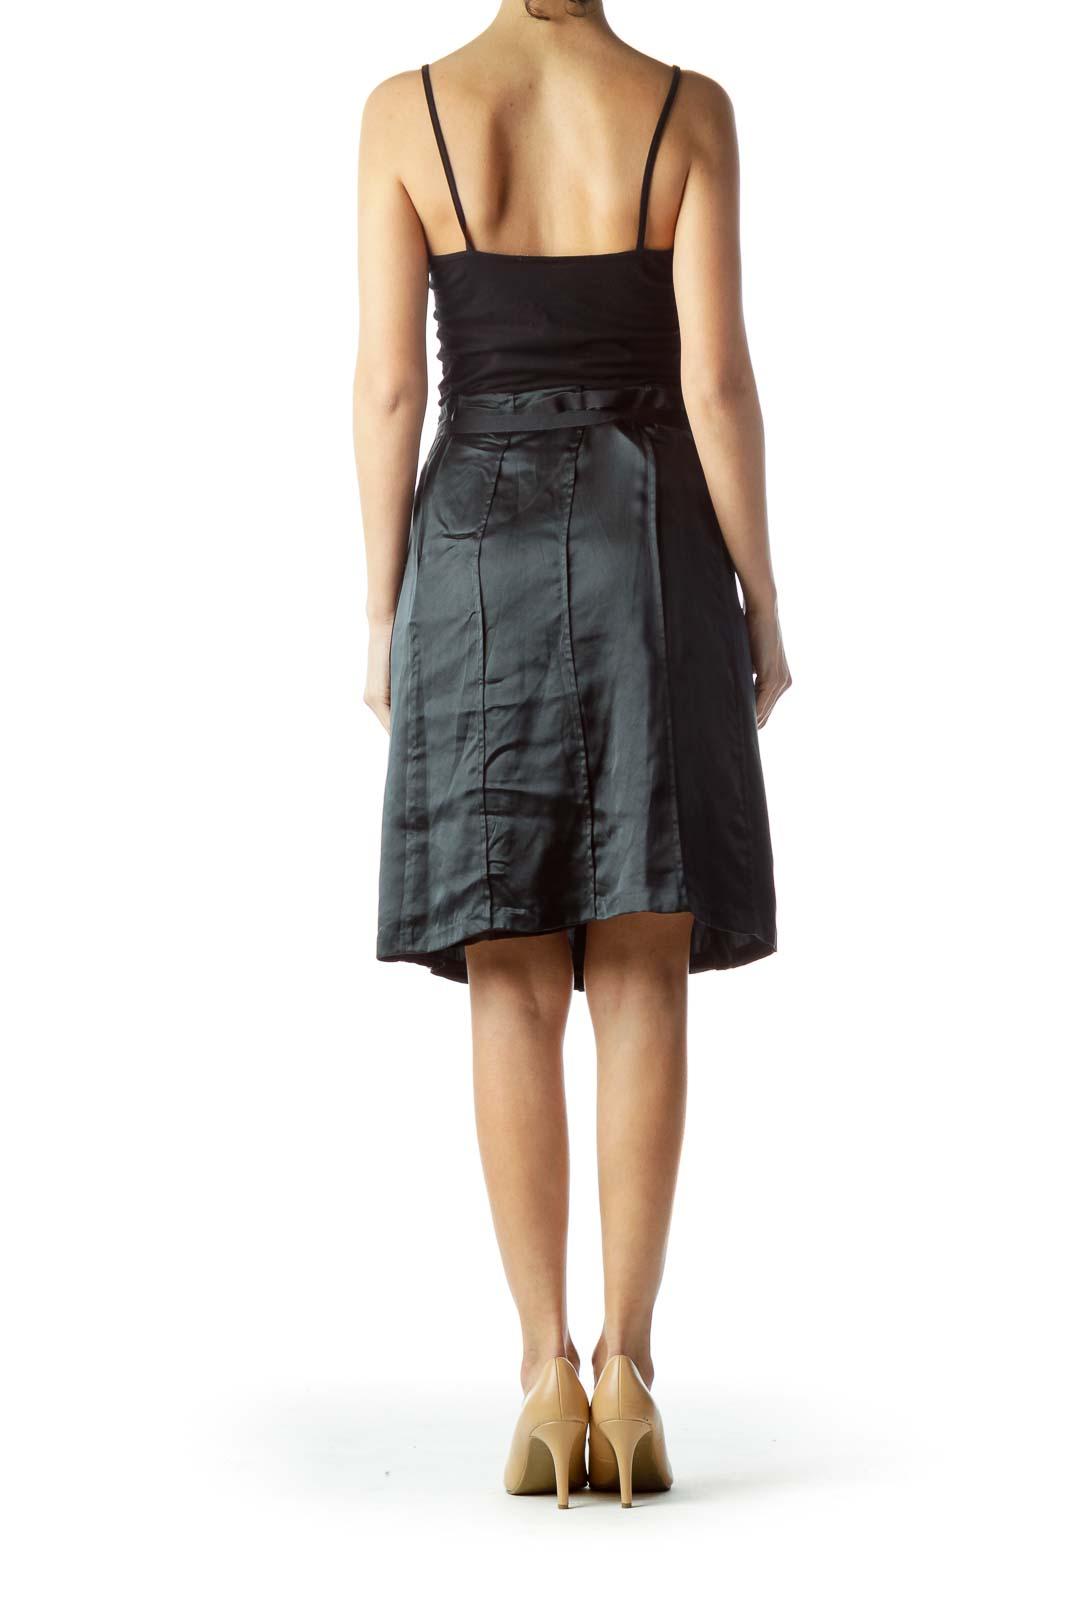 Black Flared Silk Skirt with Belt and Slip